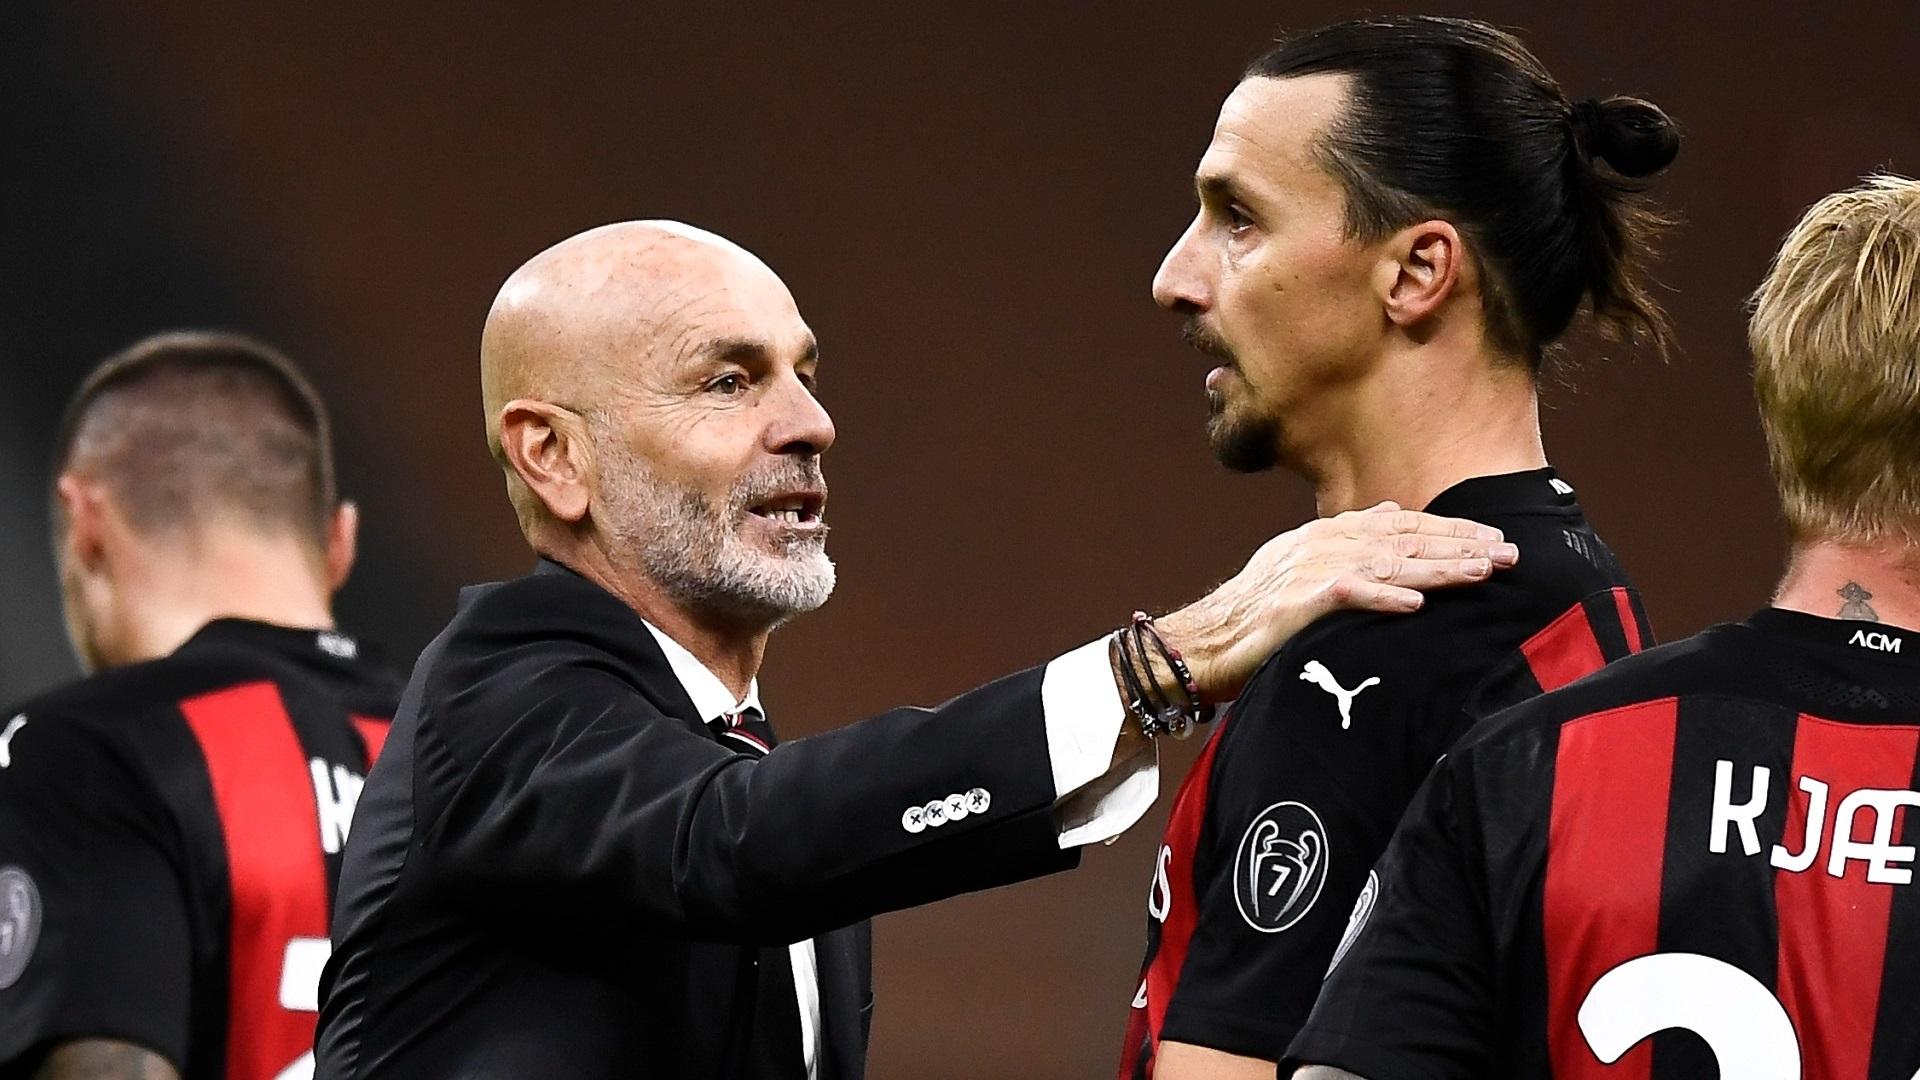 Milan, Pioli rivela cosa ha detto a Zlatan Ibrahimovic - Virgilio Sport